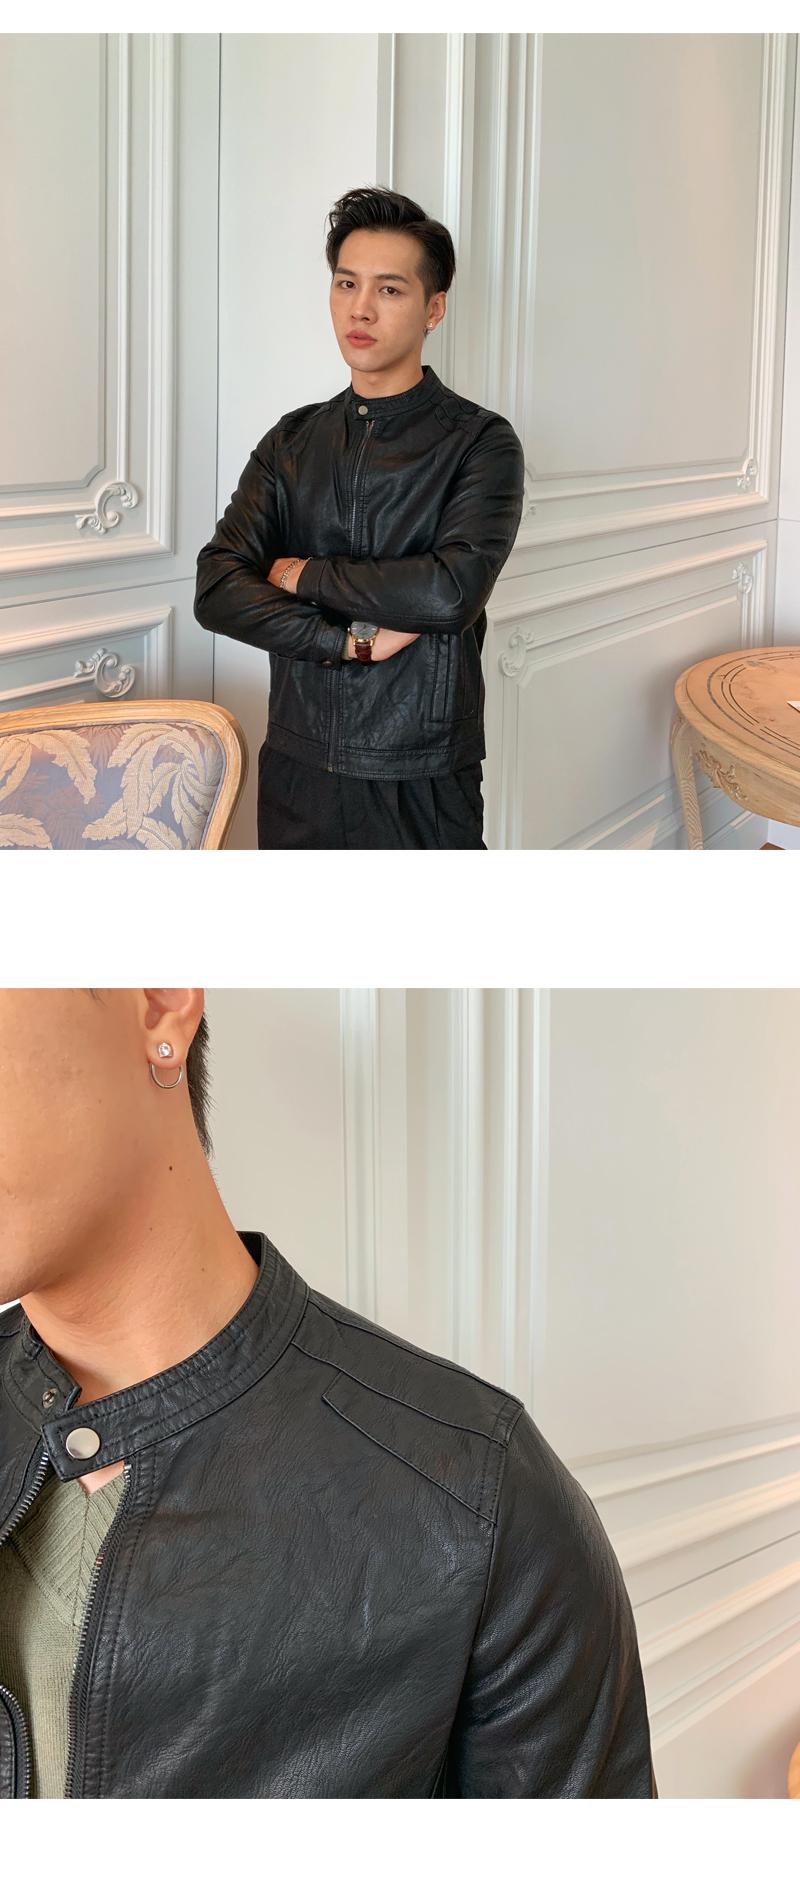 South Korea Korean version handsome collar leather jacket men's retro personality PU leather clothing fashion 100 locomotive leather fashion tide 55 Online shopping Bangladesh